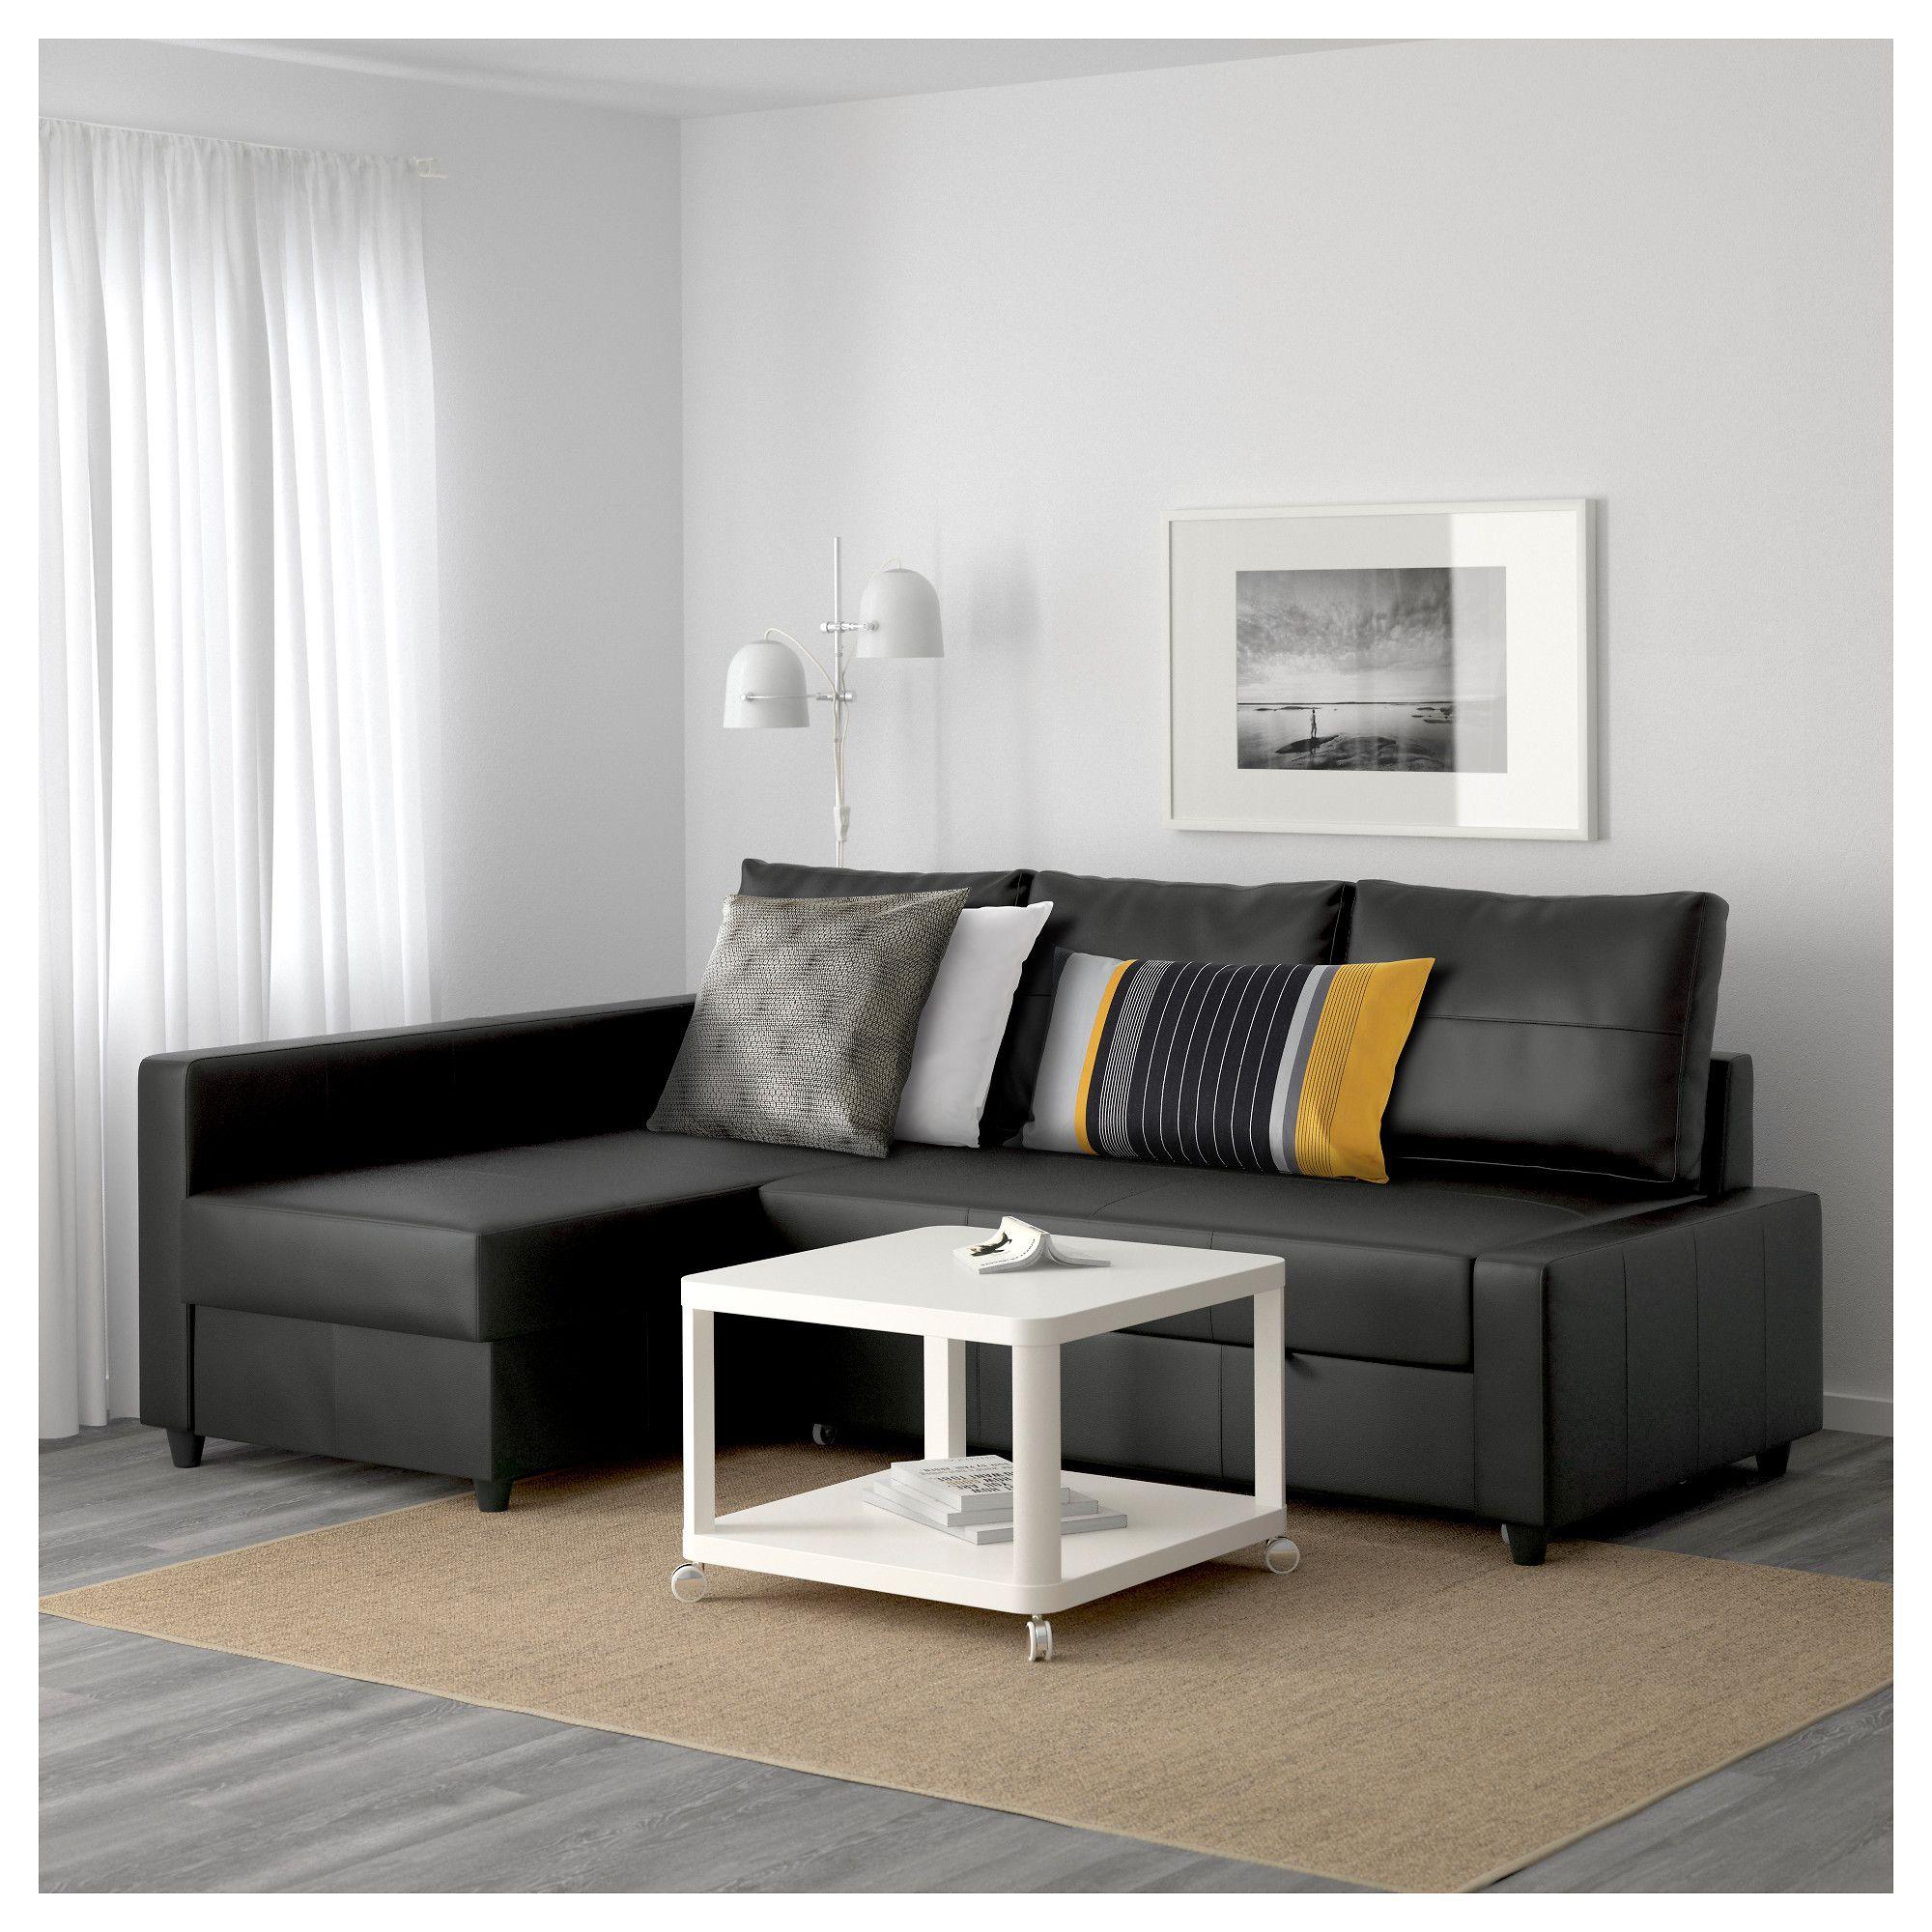 Astonishing Ikea Friheten Corner Sofa Bed With Storage Bomstad Black Onthecornerstone Fun Painted Chair Ideas Images Onthecornerstoneorg